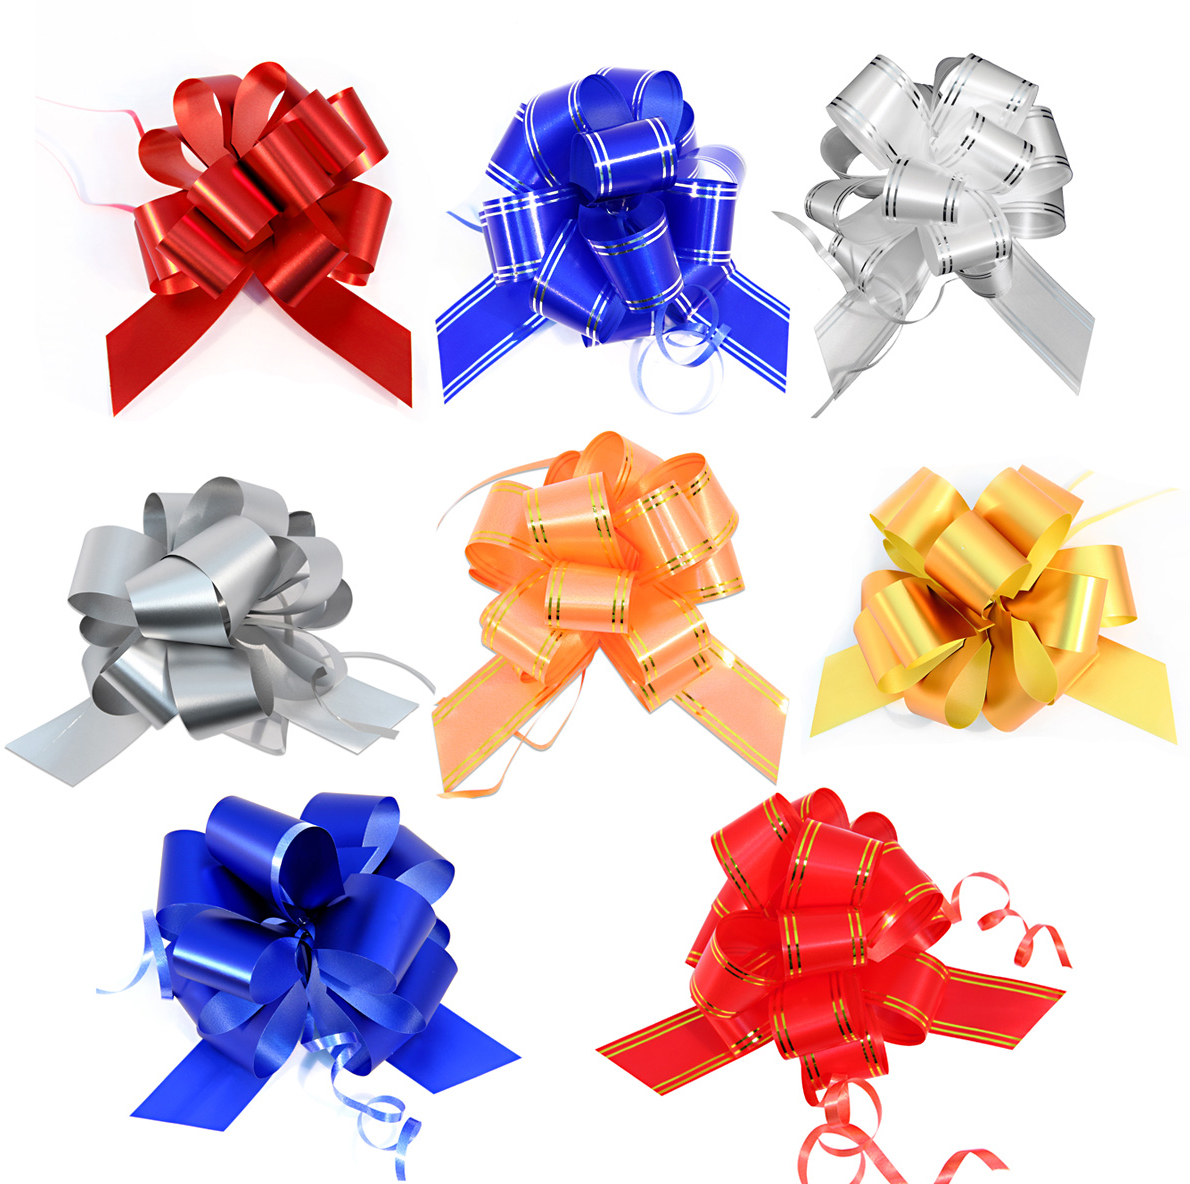 Бант упаковочный Veld-Co Шар, цвет: мультиколор, 3 х 100 см, 10 шт. 42378 набор подарочных коробок veld co цветочная абстракция кубы 3 шт 53452